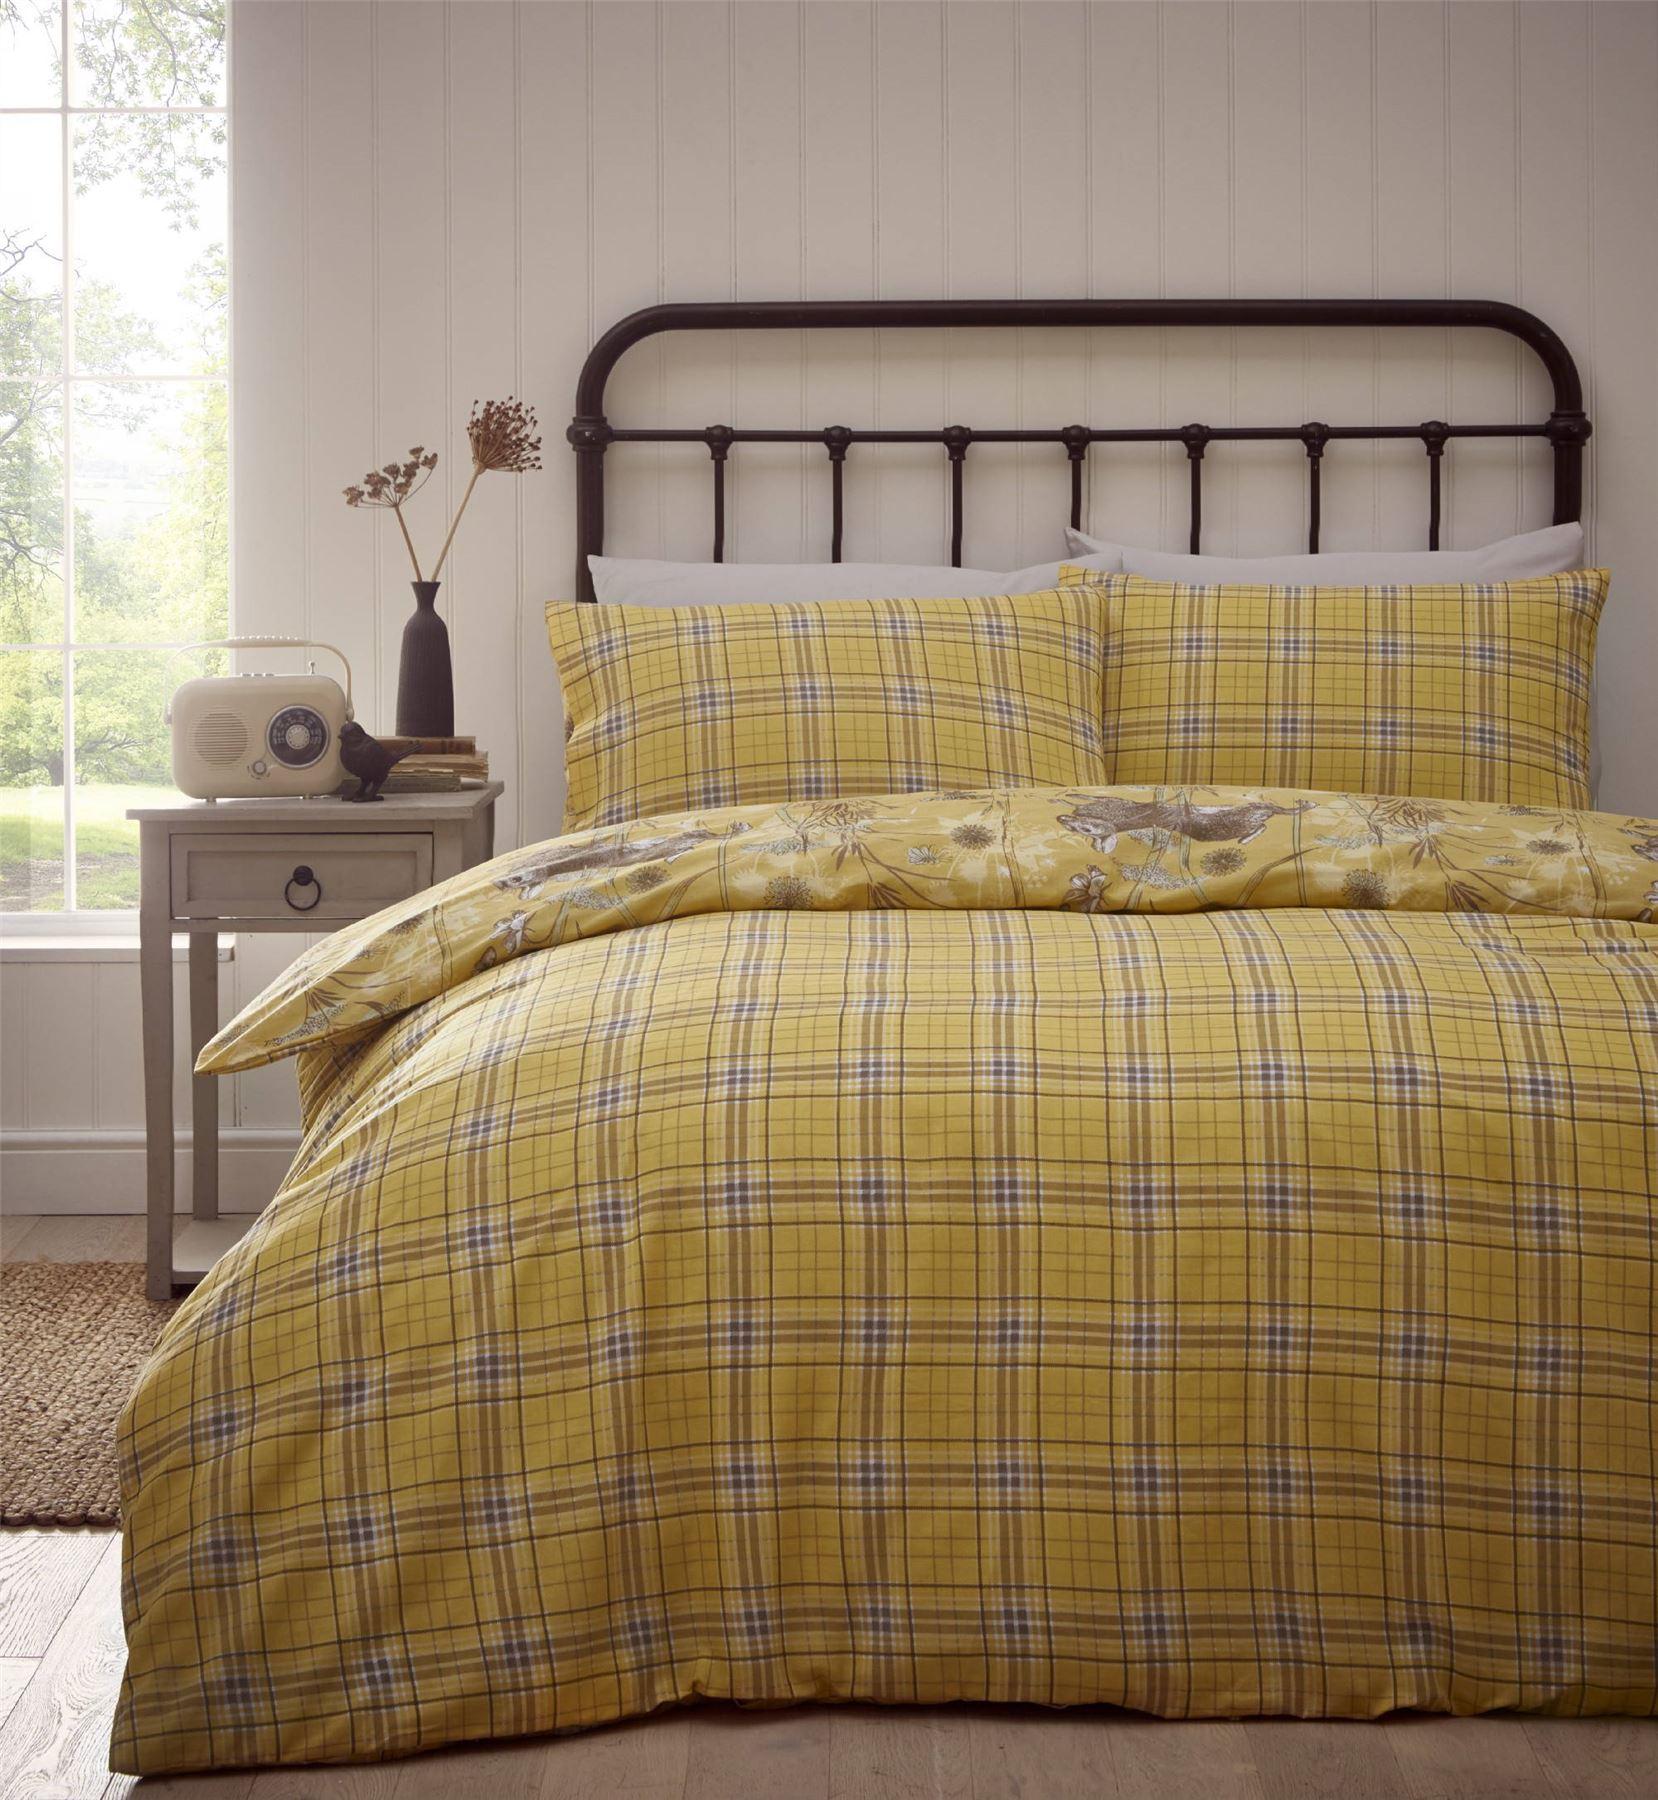 Rabbit-Meadow-Animals-Reversible-Check-Tartan-Duvet-Cover-Bedding-Bed-Set thumbnail 5